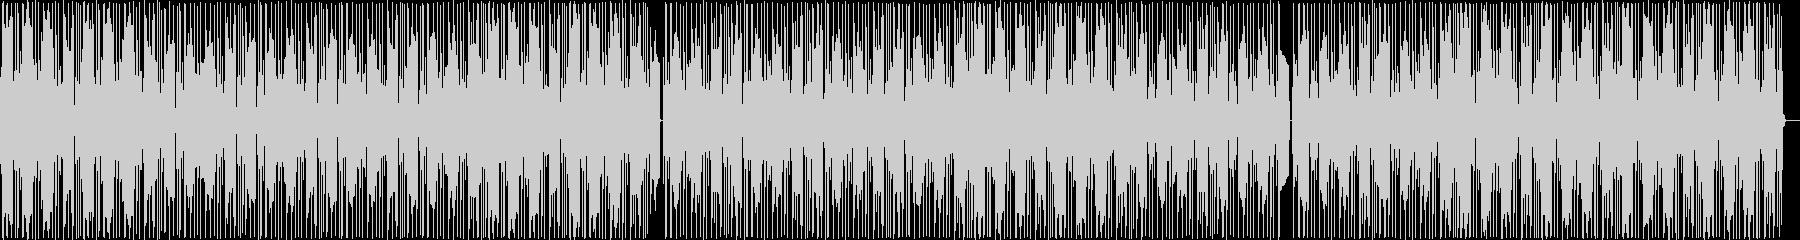 Urban sound with a sense of urgency in lightness's unreproduced waveform